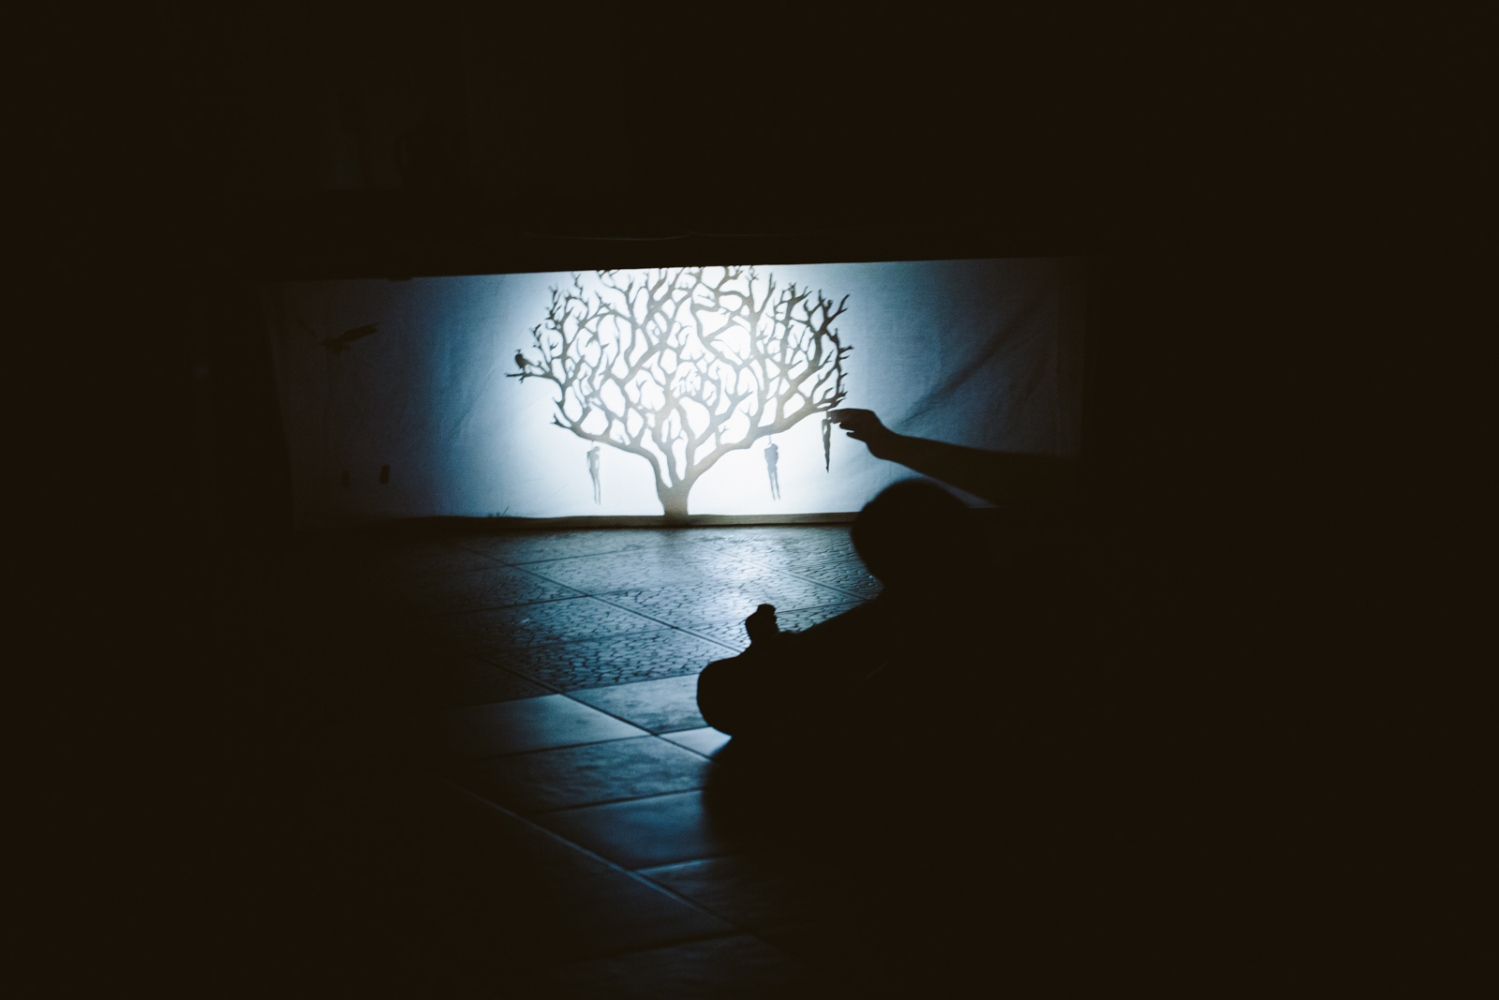 Art and Documentary Photography - Loading quatre_chemins_-_un_arc-en-ciel...._-web-_k2d-12.jpg